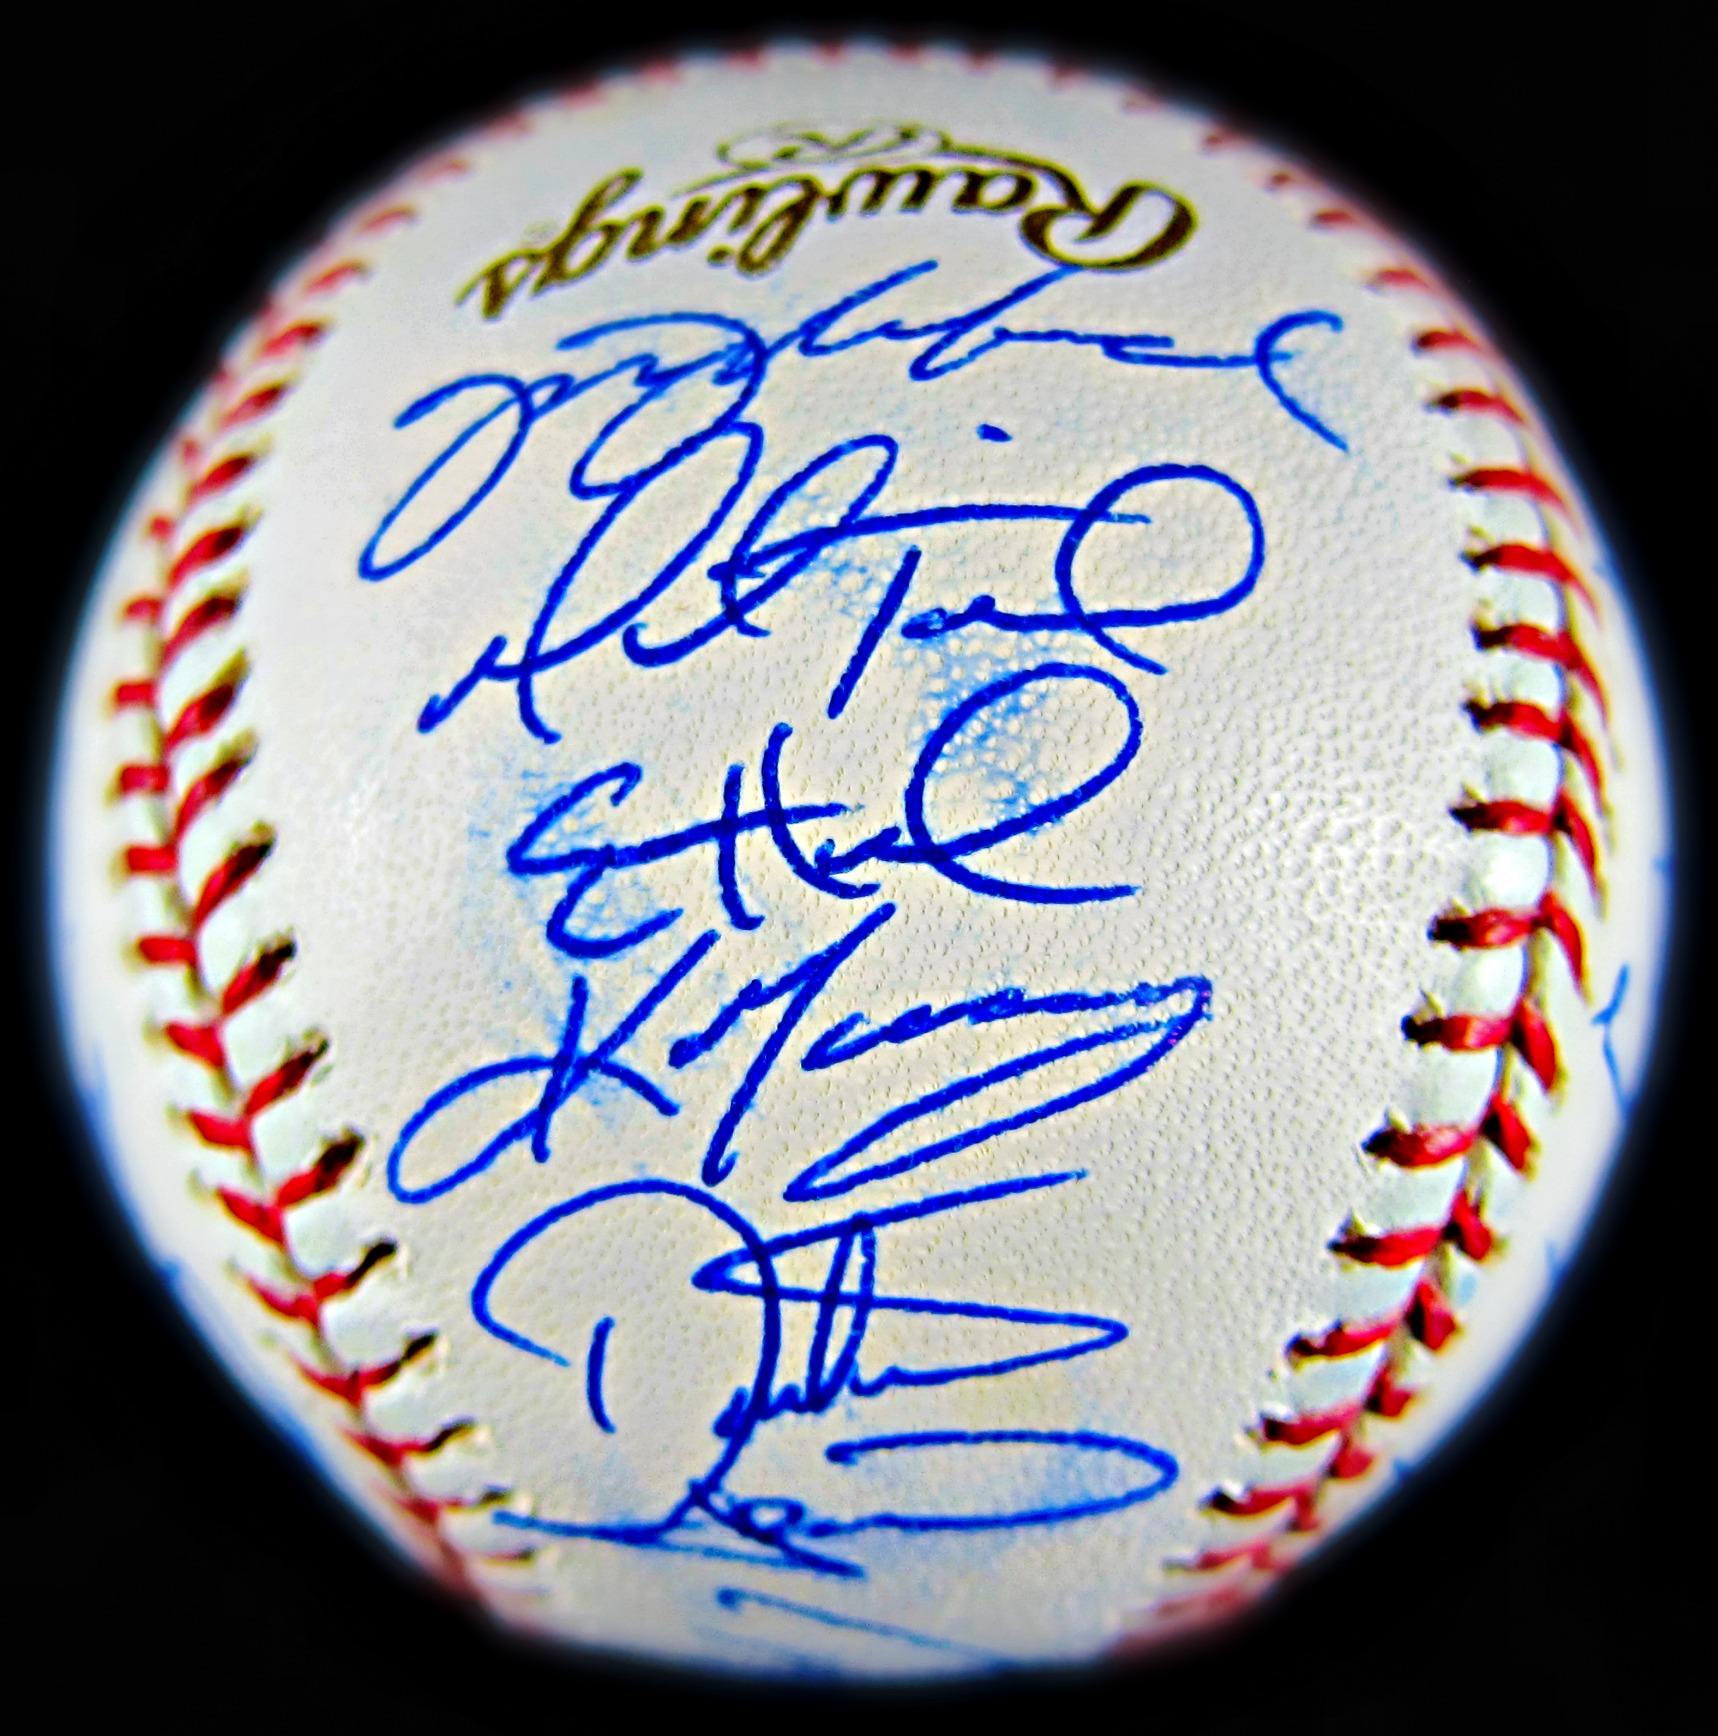 boston red sox baseball team